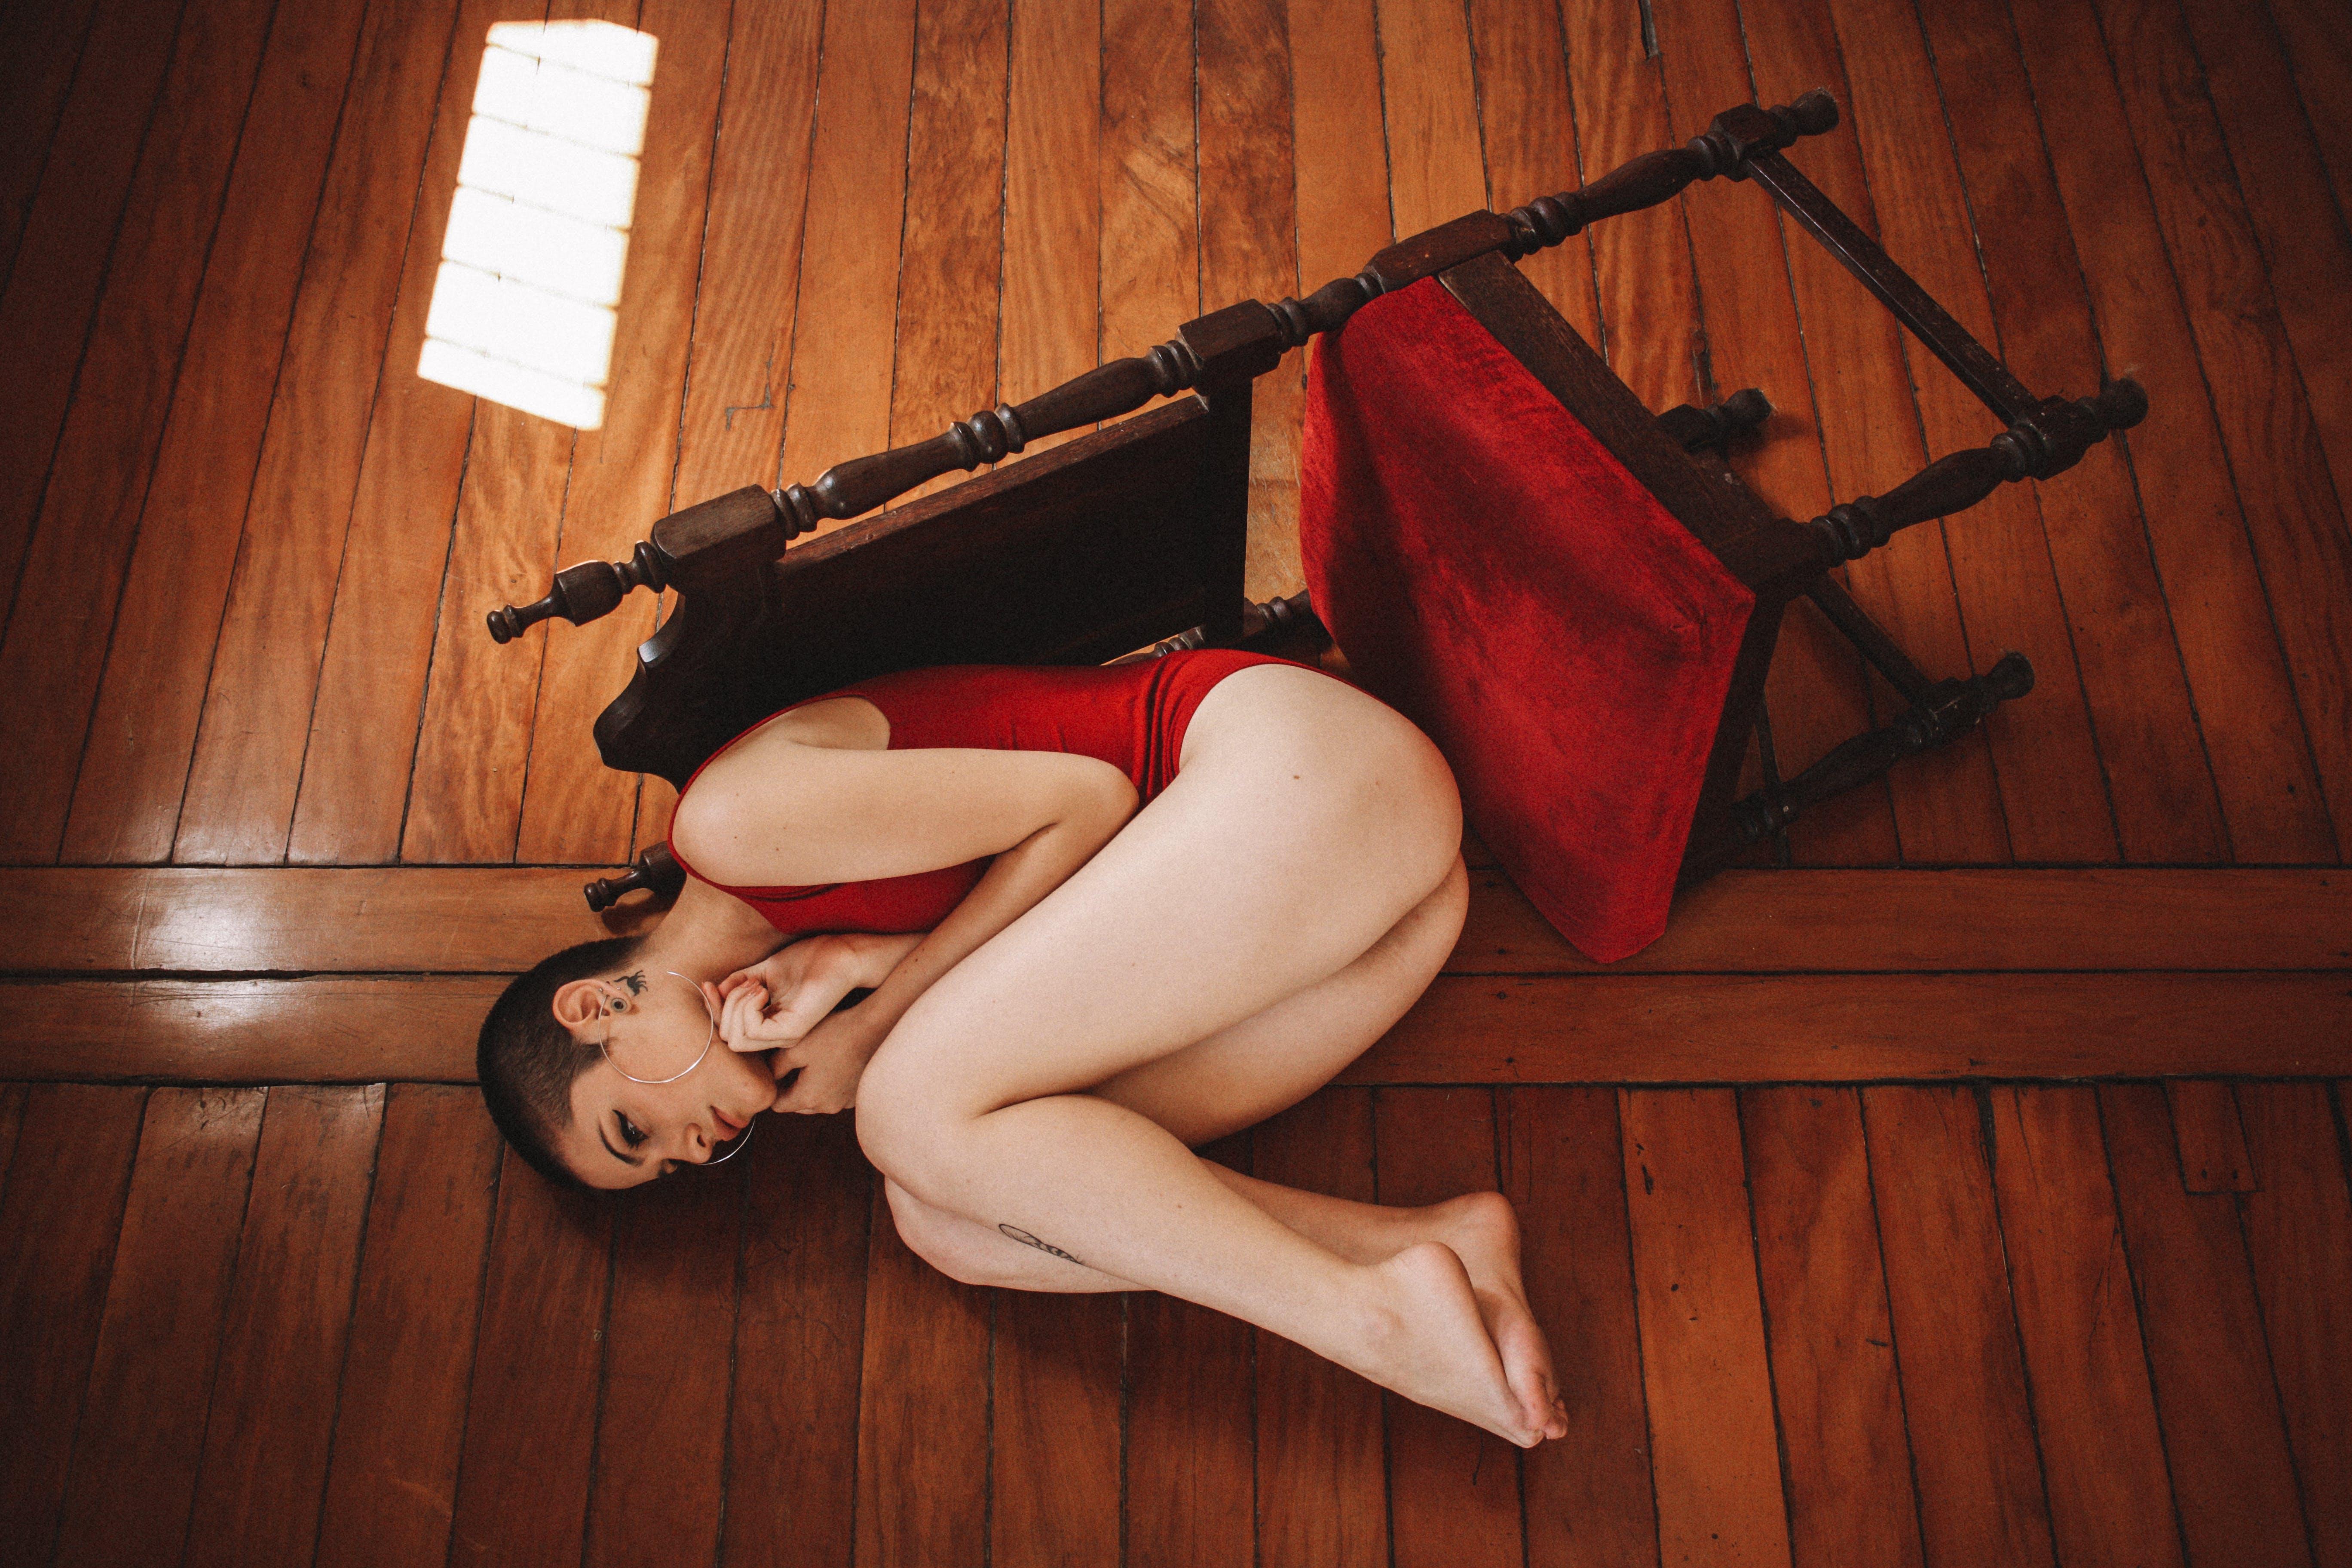 Woman Wearing Red Monokini Beside Brown Wooden Surface